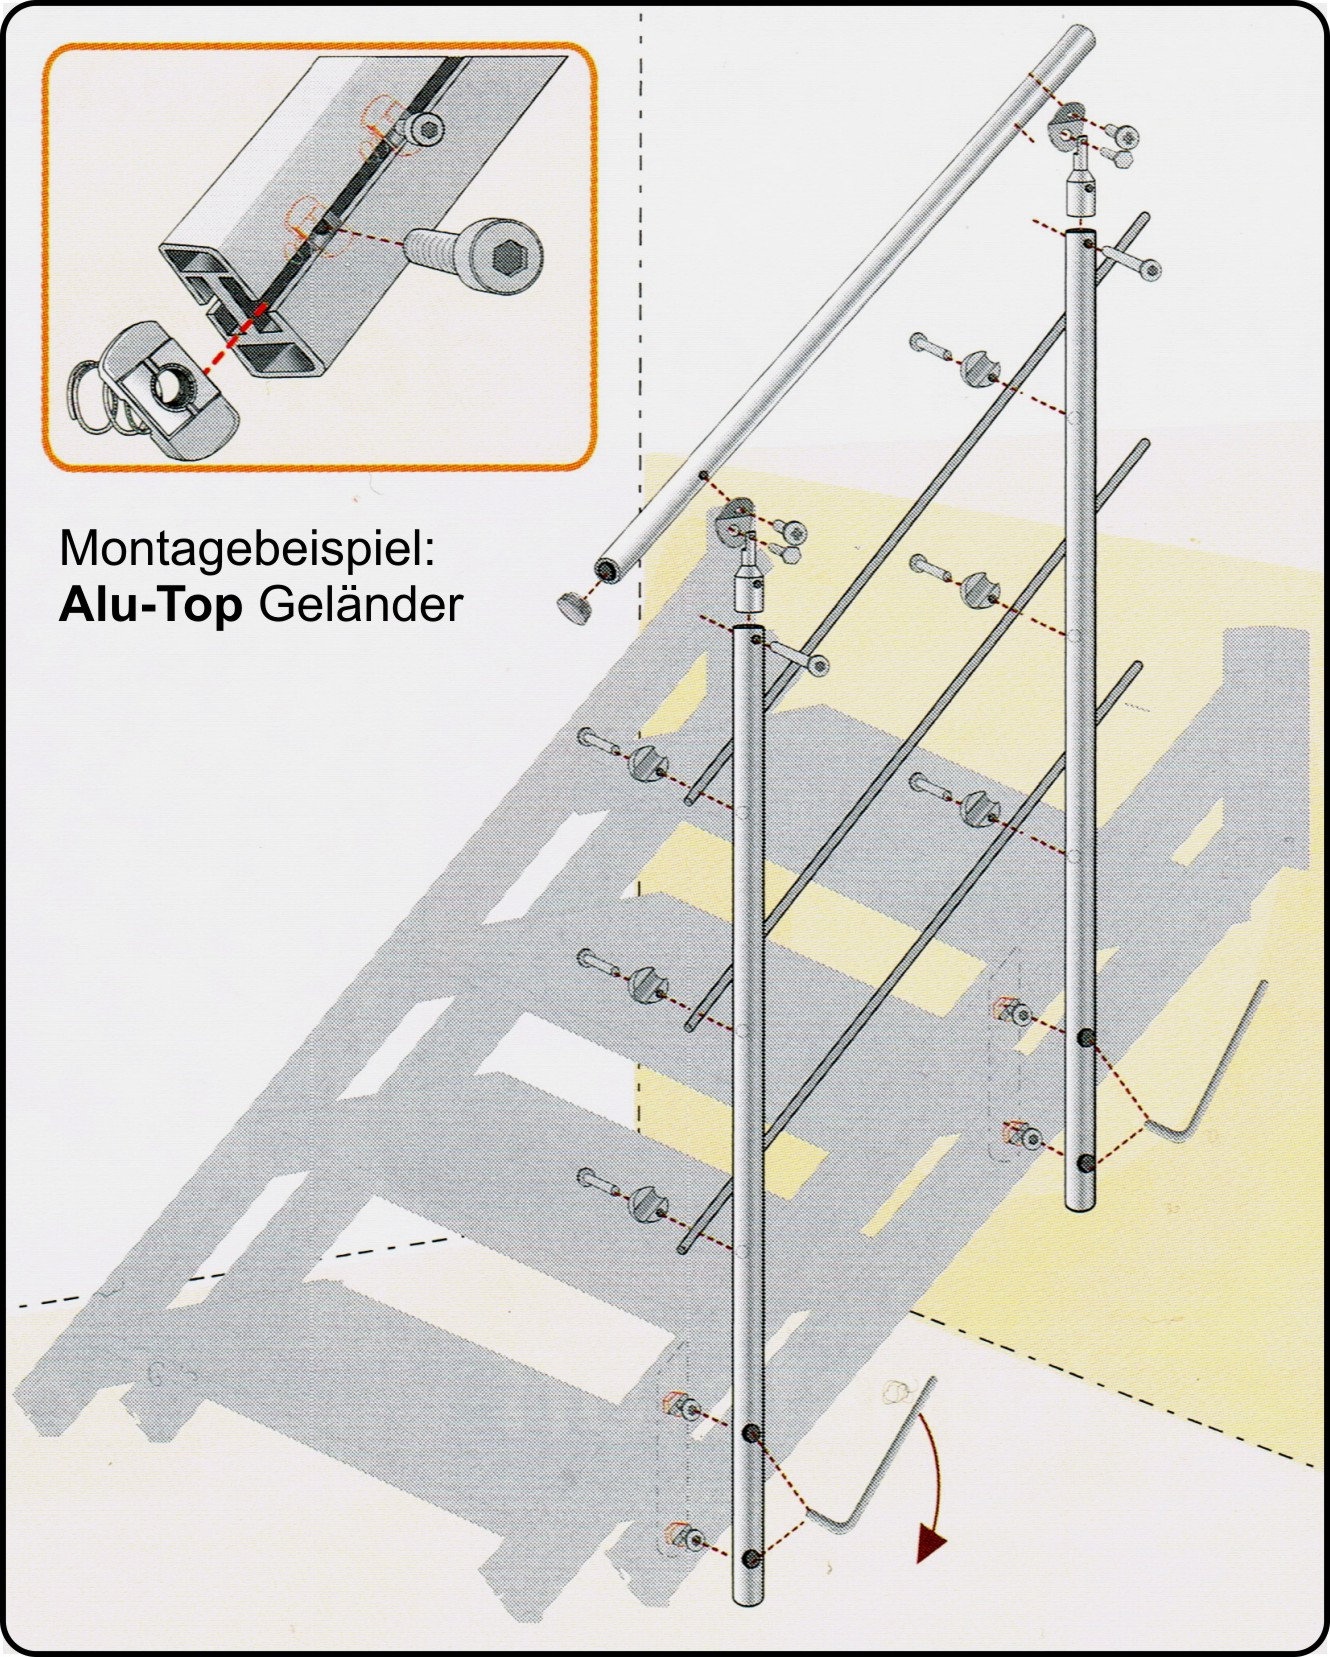 MO-Beispiel-Alu-Top